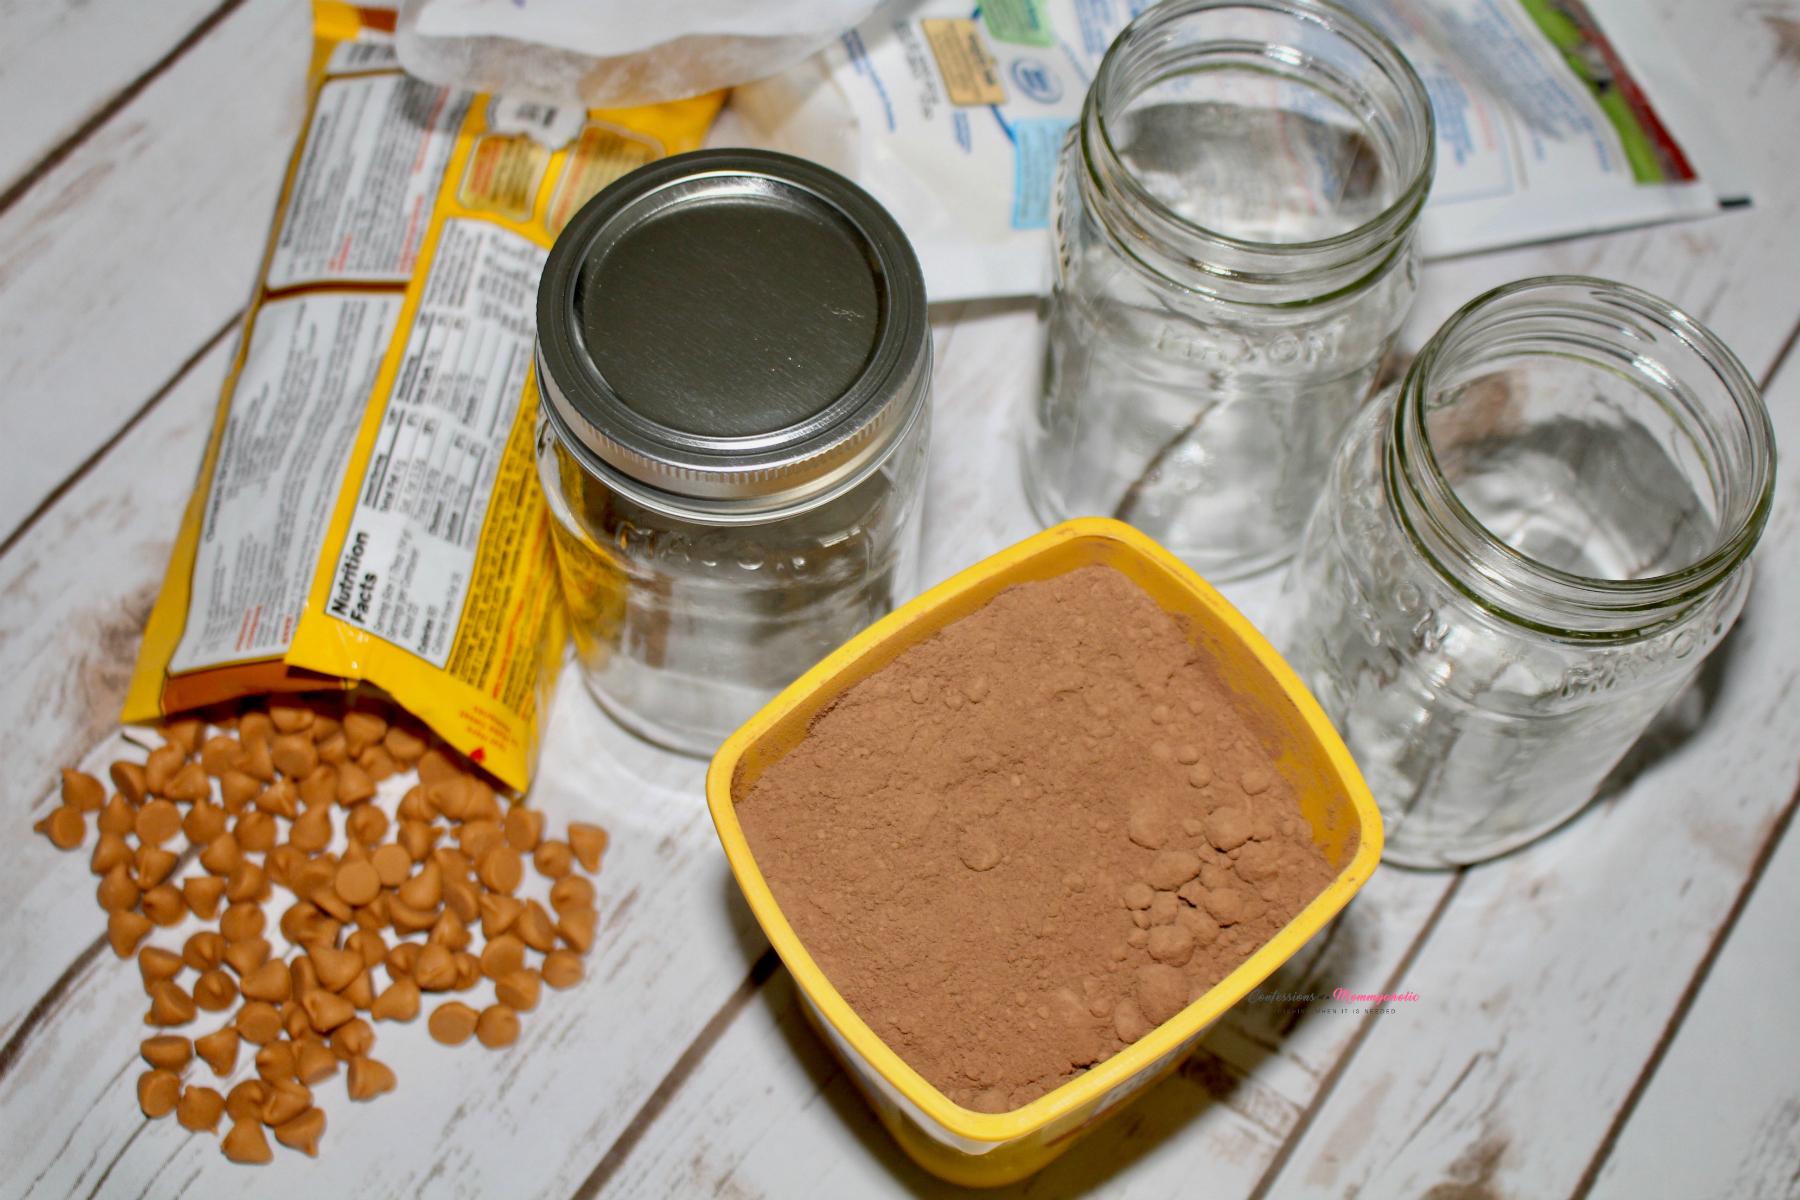 Supplies for Pumpkin Spice Hot Chocolate Mix